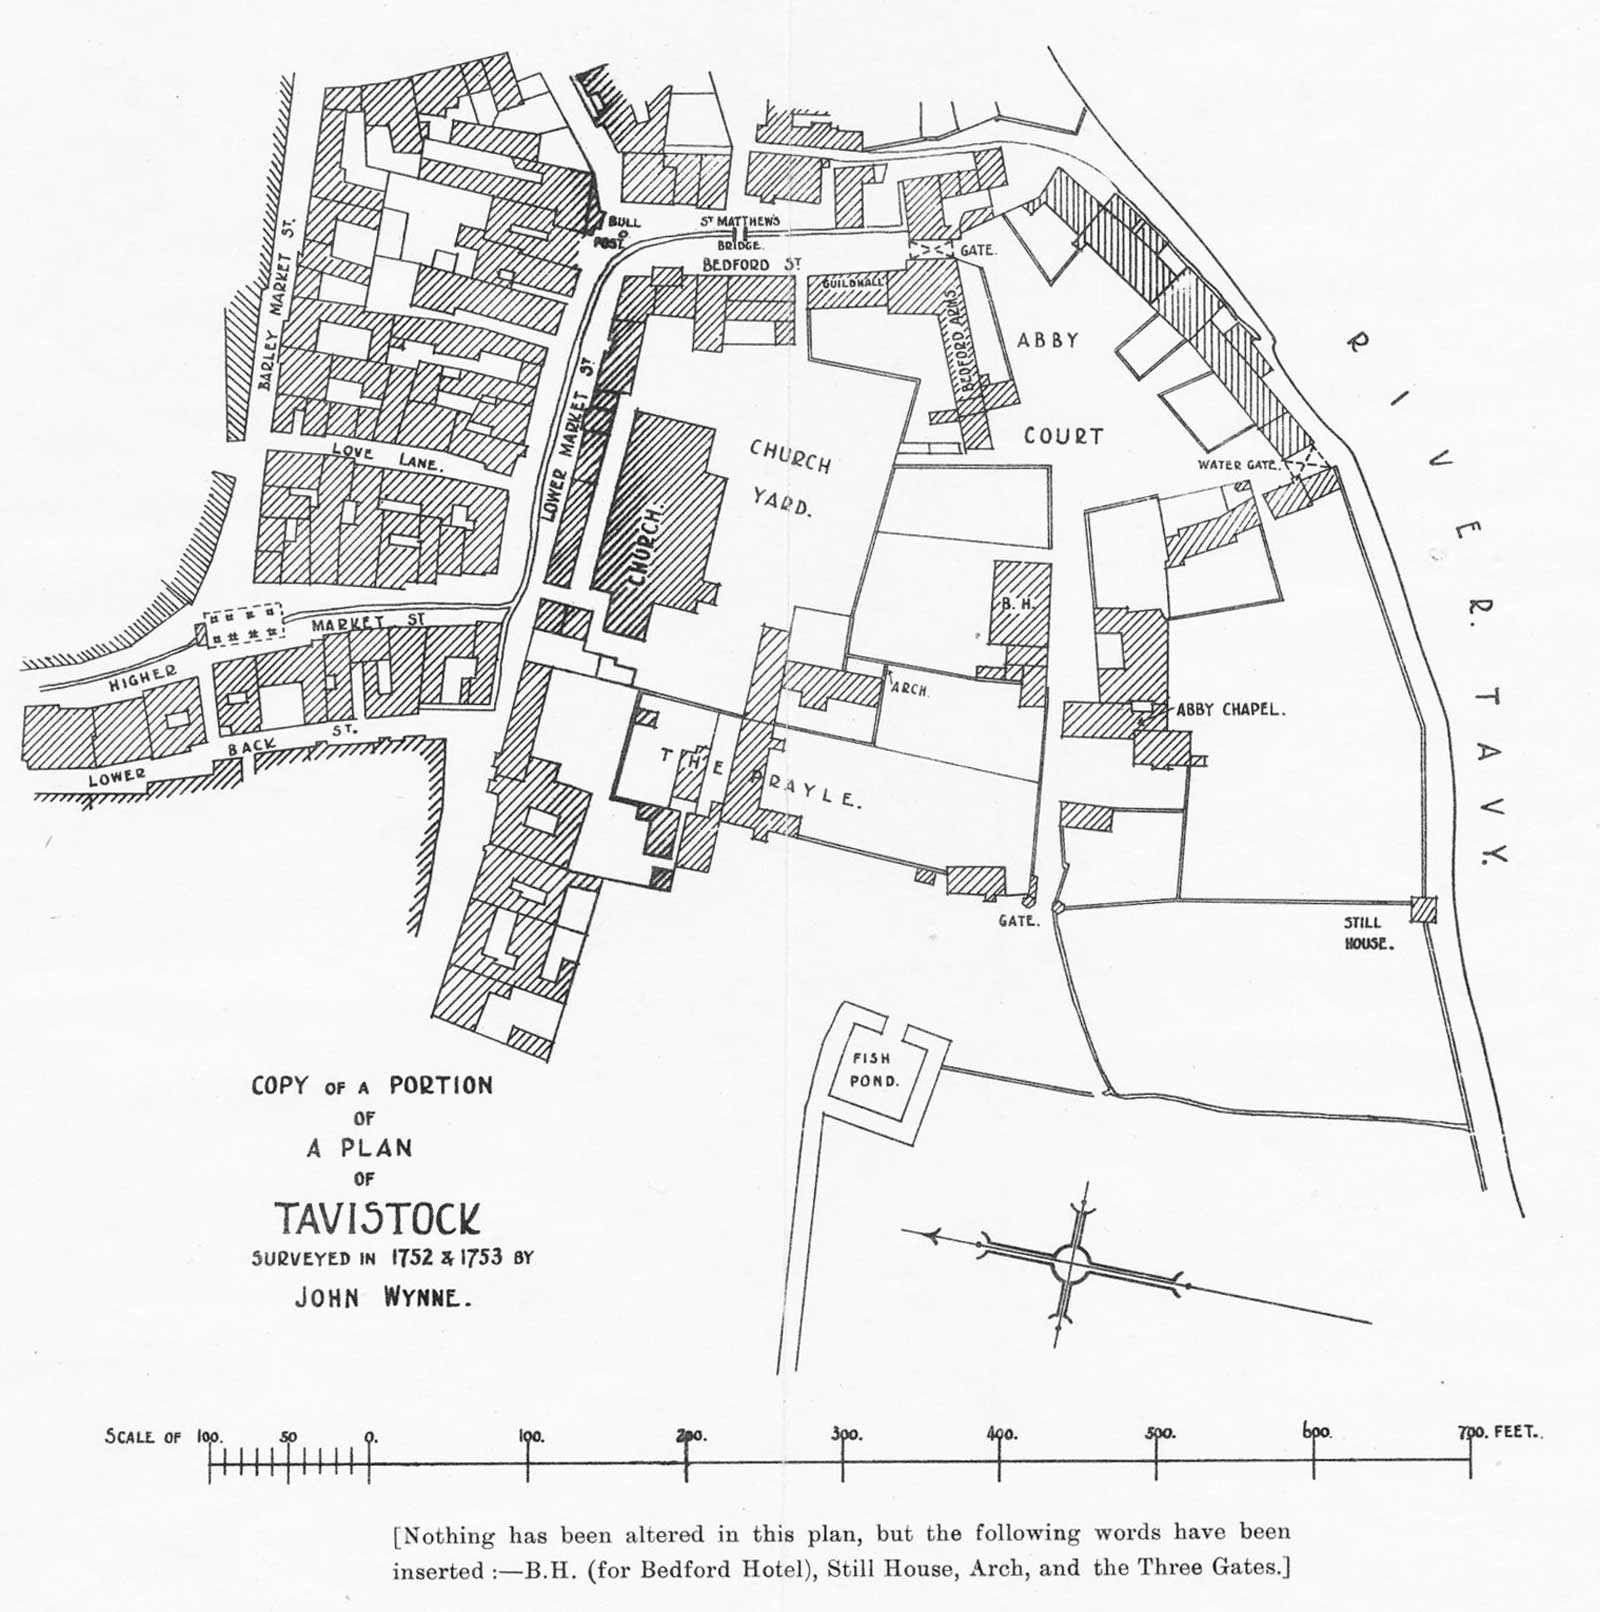 Abbey Map Tavistock